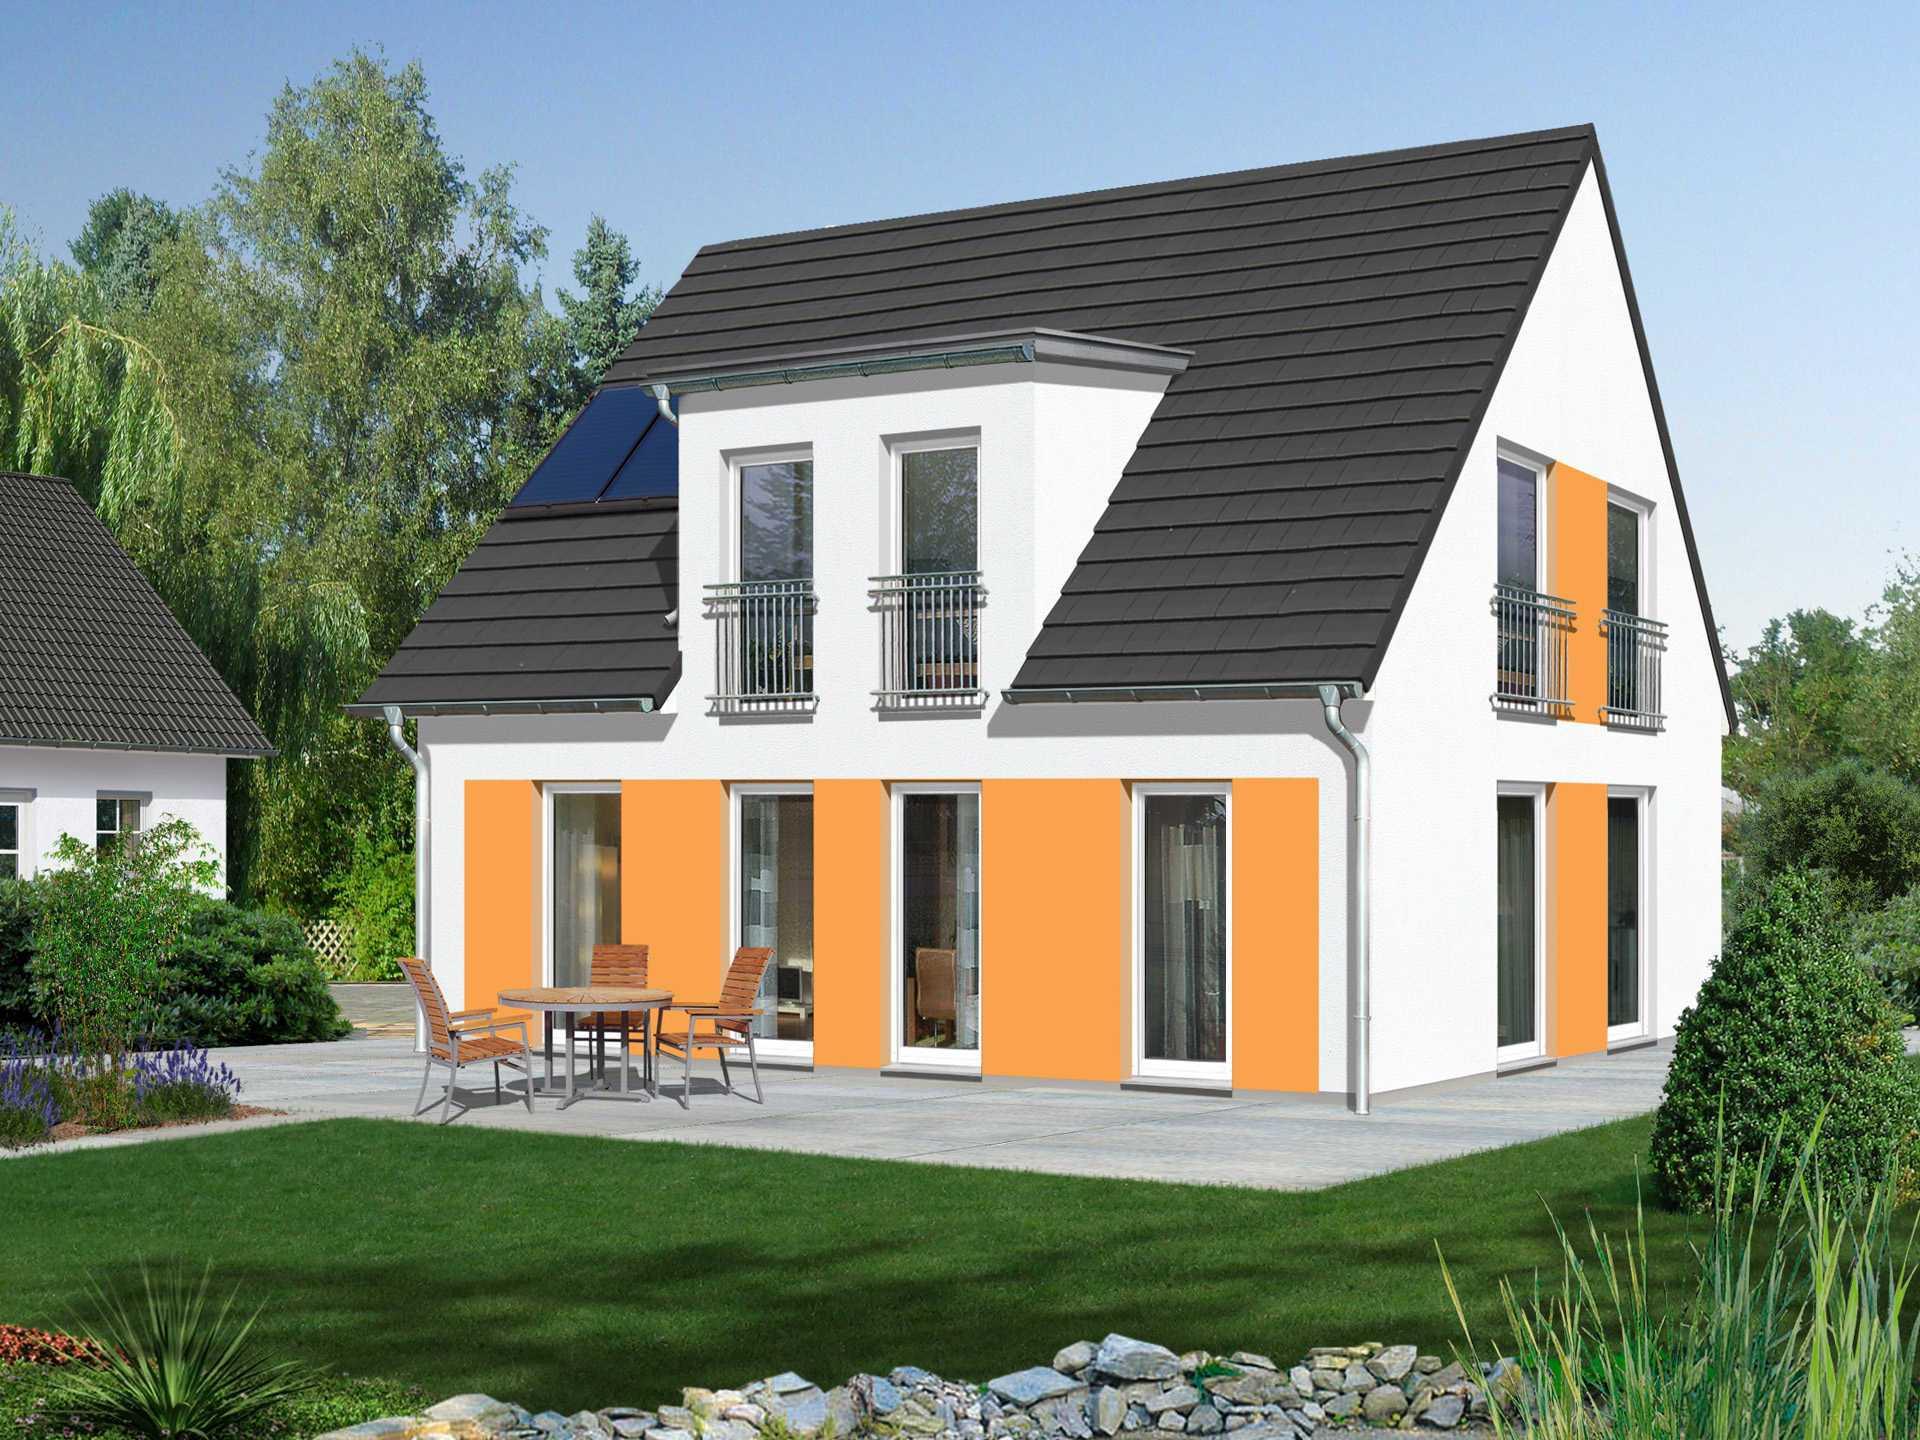 Matthias Heider - Town & Country, Haus Flair 113 Trend